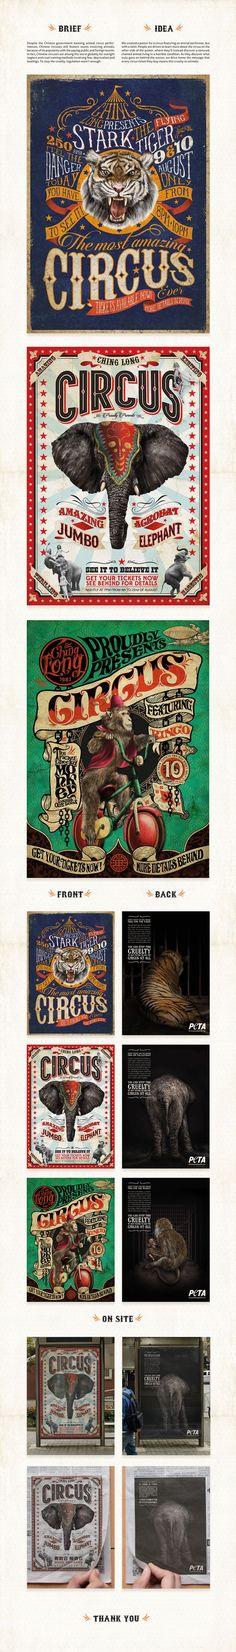 Peta Circus on Behance: